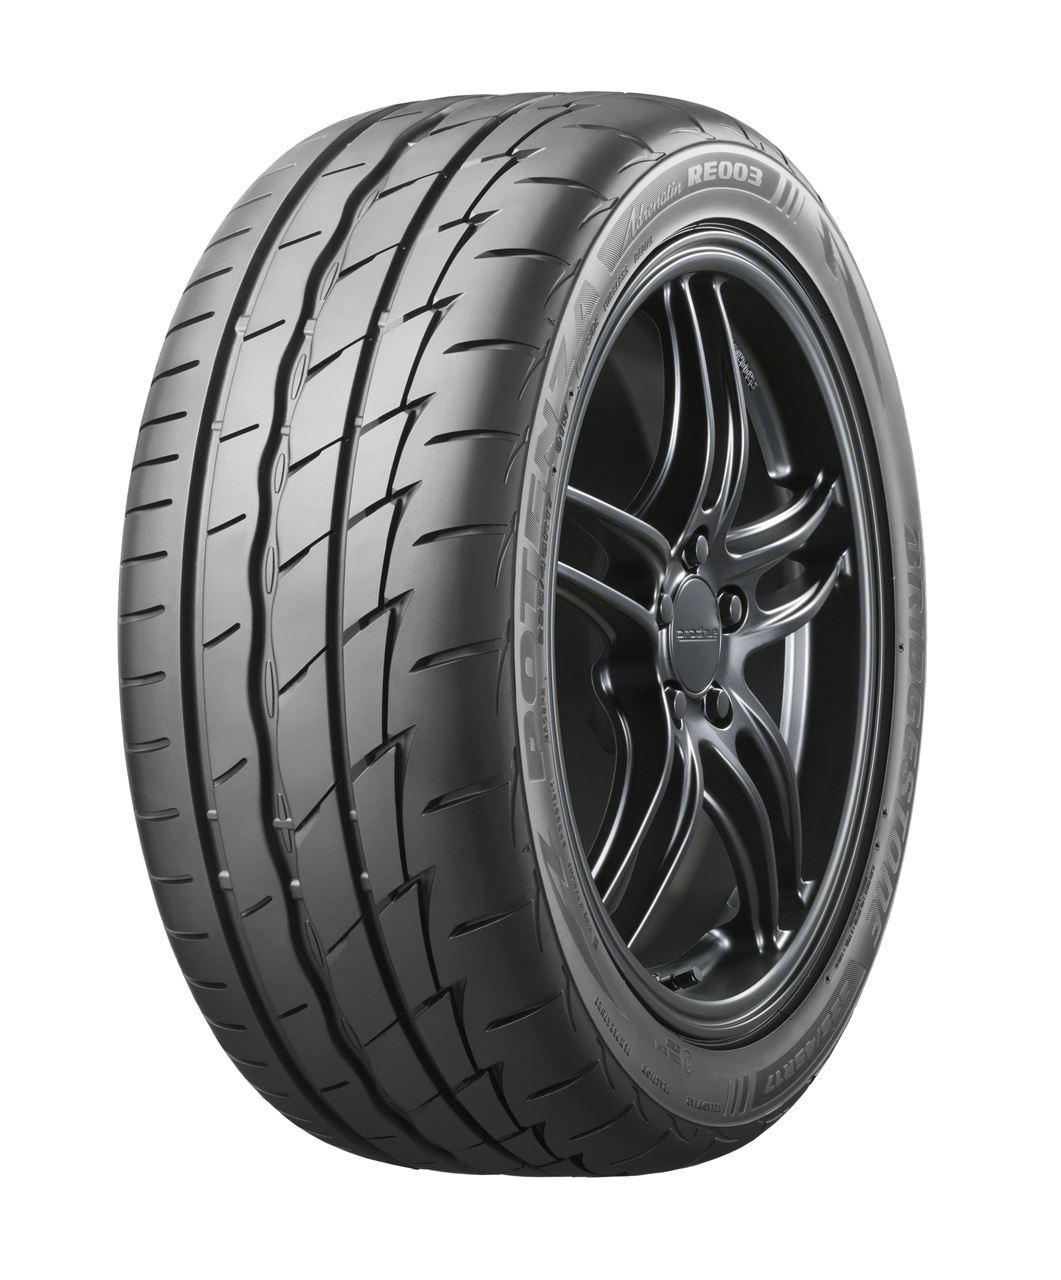 Шина 215/60R16 95V Potenza RE003 Bridgestone Літо